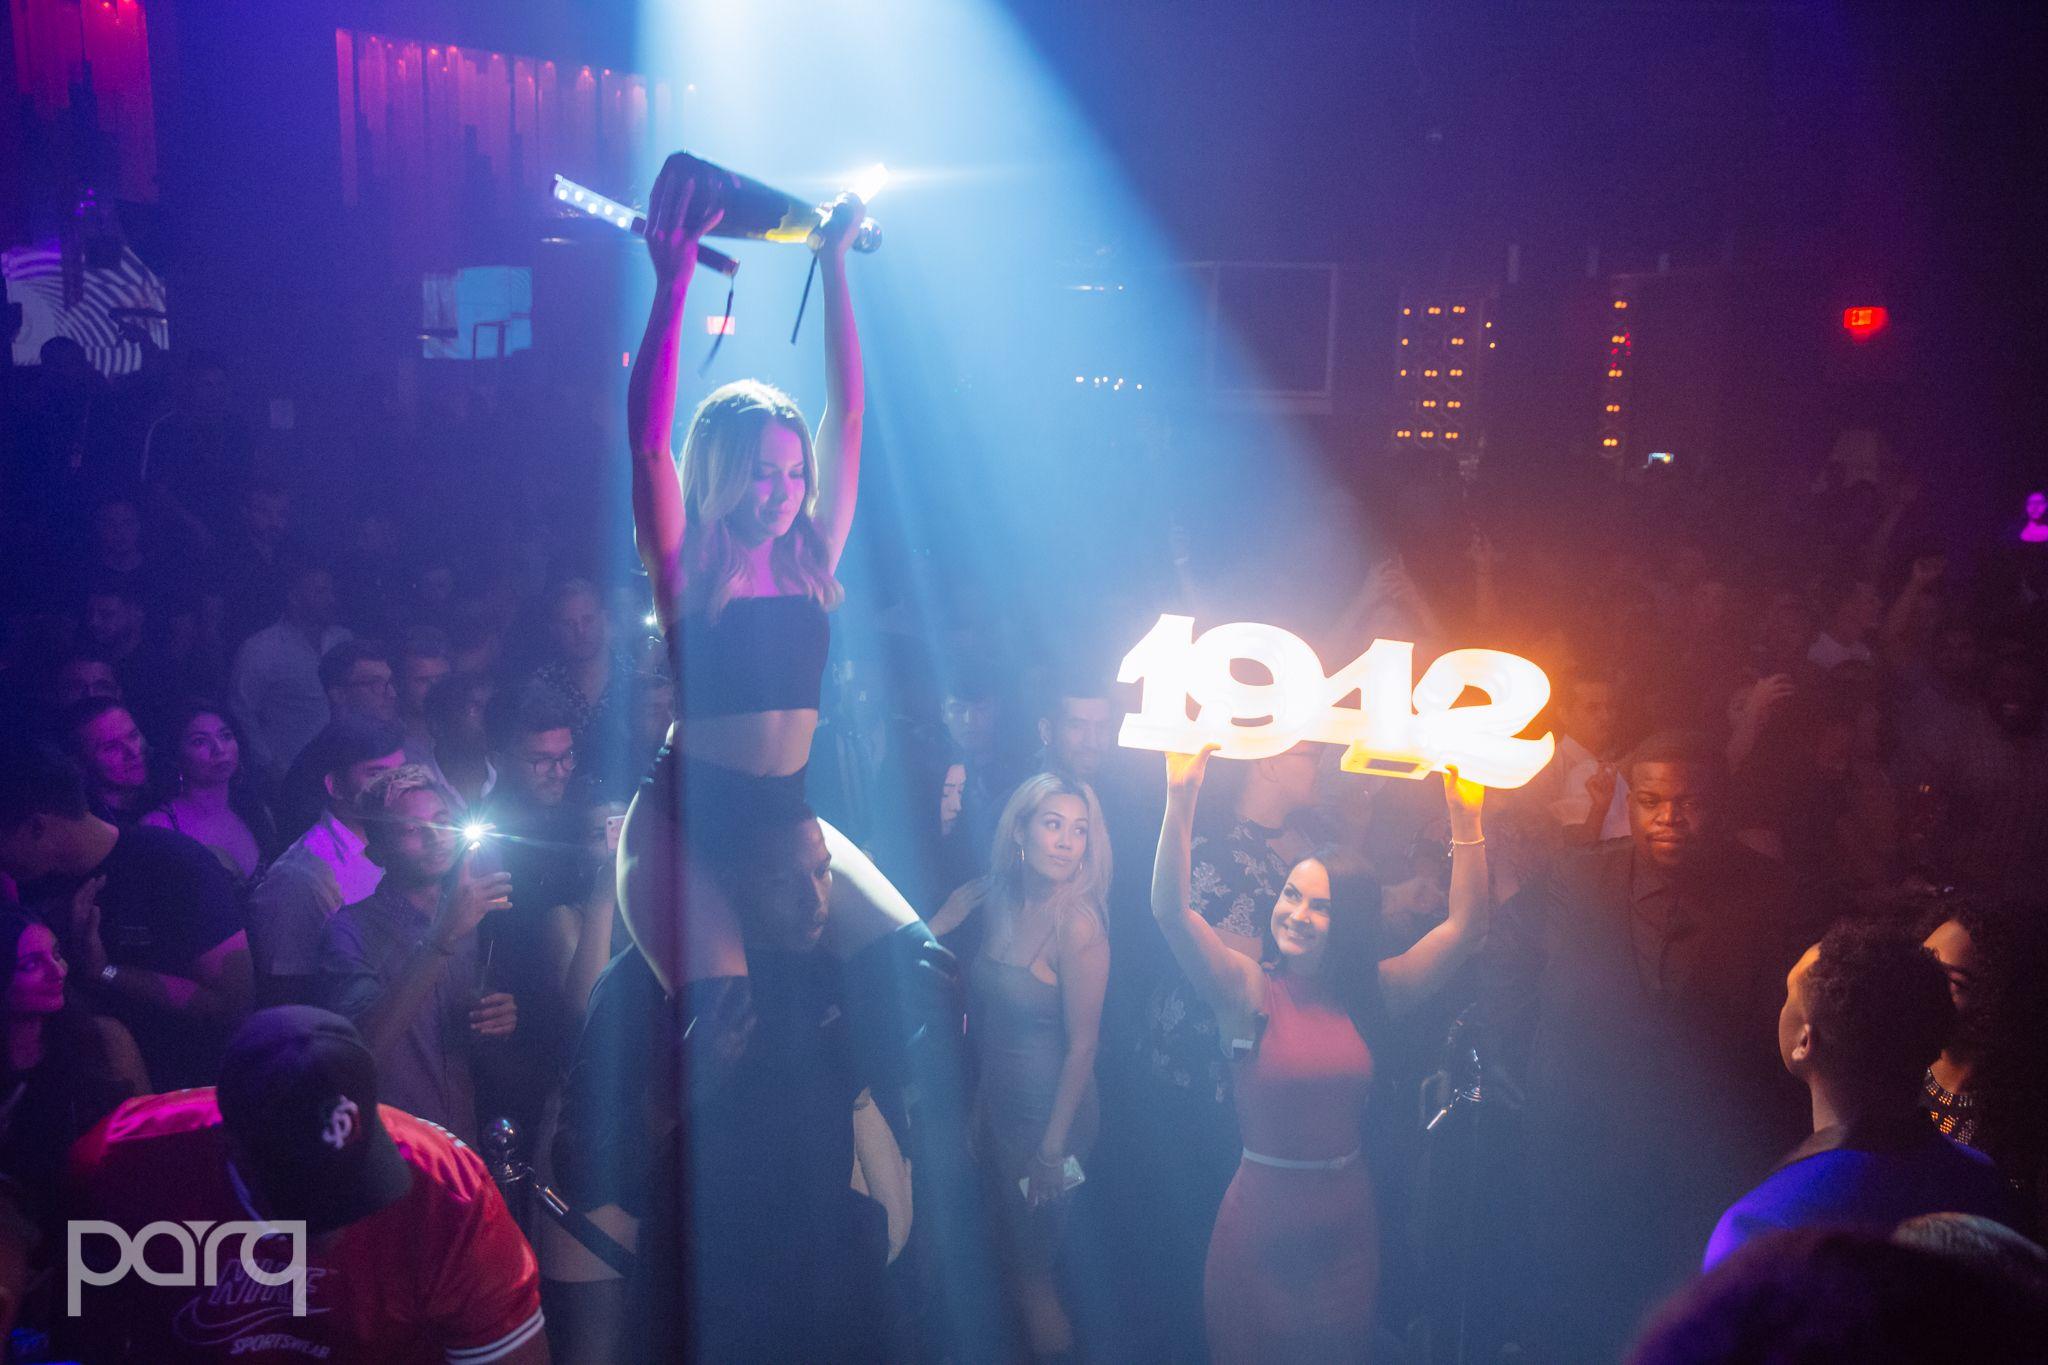 09.27.18 Parq - DJ Khaled-9.jpg